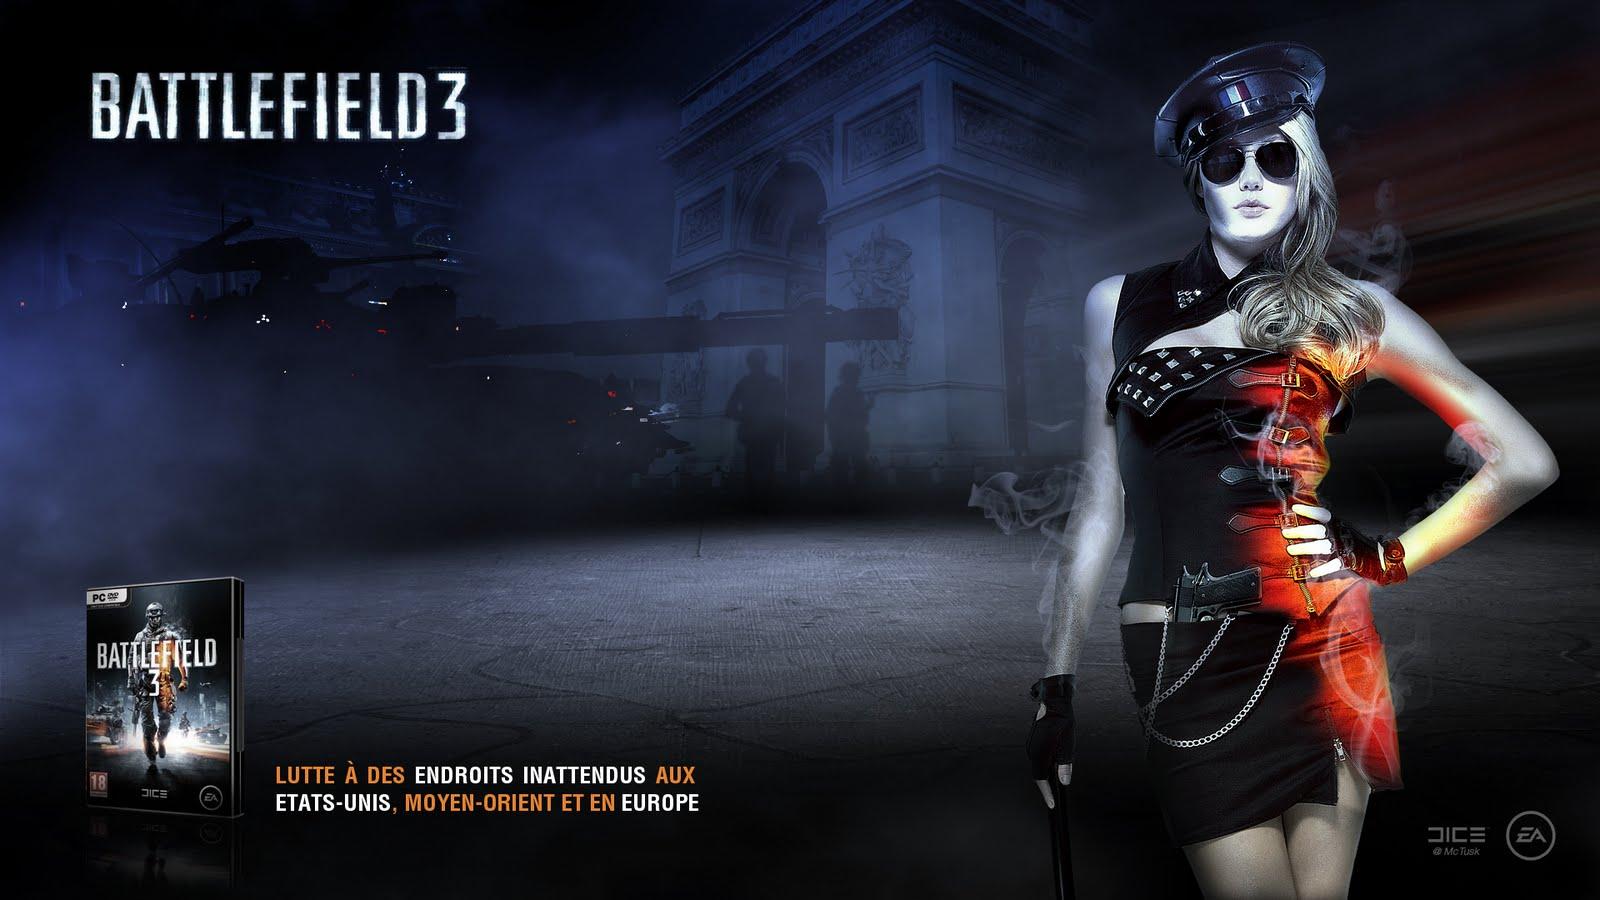 http://1.bp.blogspot.com/-L9s1k412Ij4/TeeS-k0e6SI/AAAAAAAAAEY/RGbHe3uG-Qs/s1600/Battlefield+3+Wallpapers-5.jpg